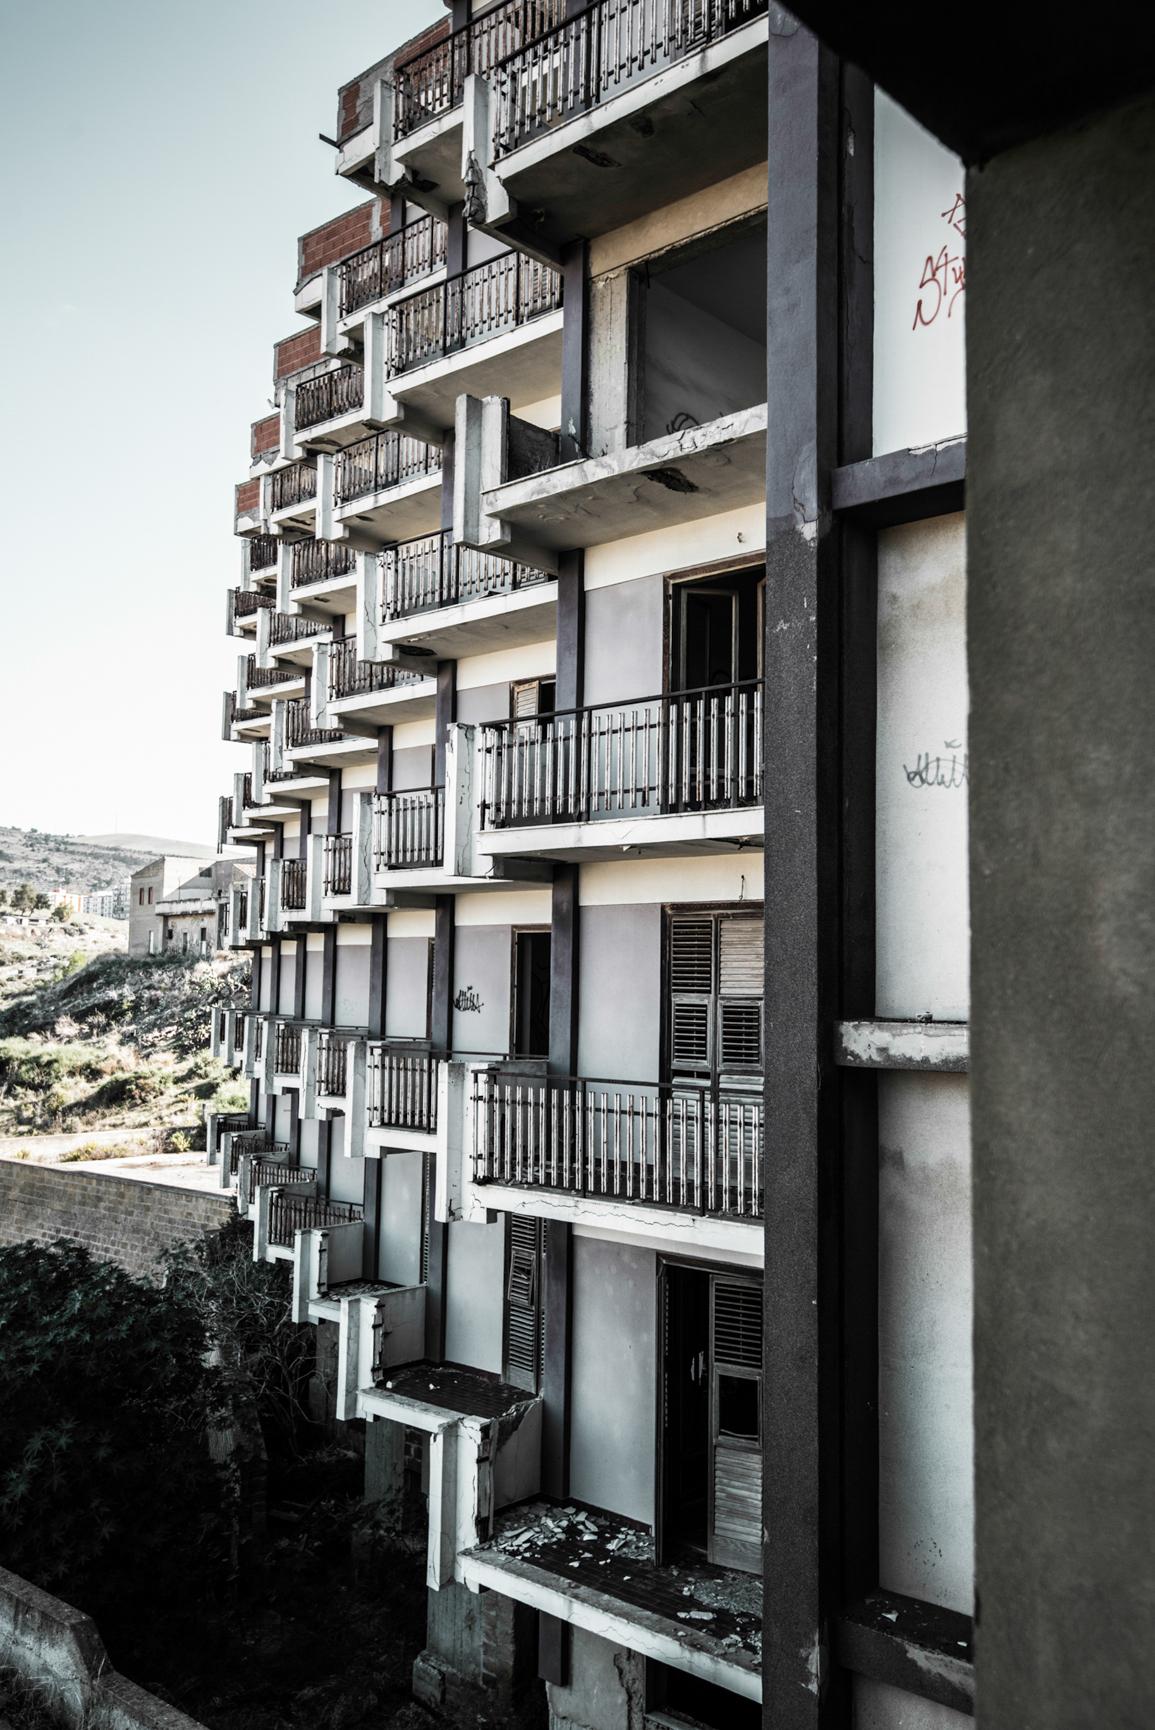 portoempedocle (agrigento) Hotel africa (12).jpg